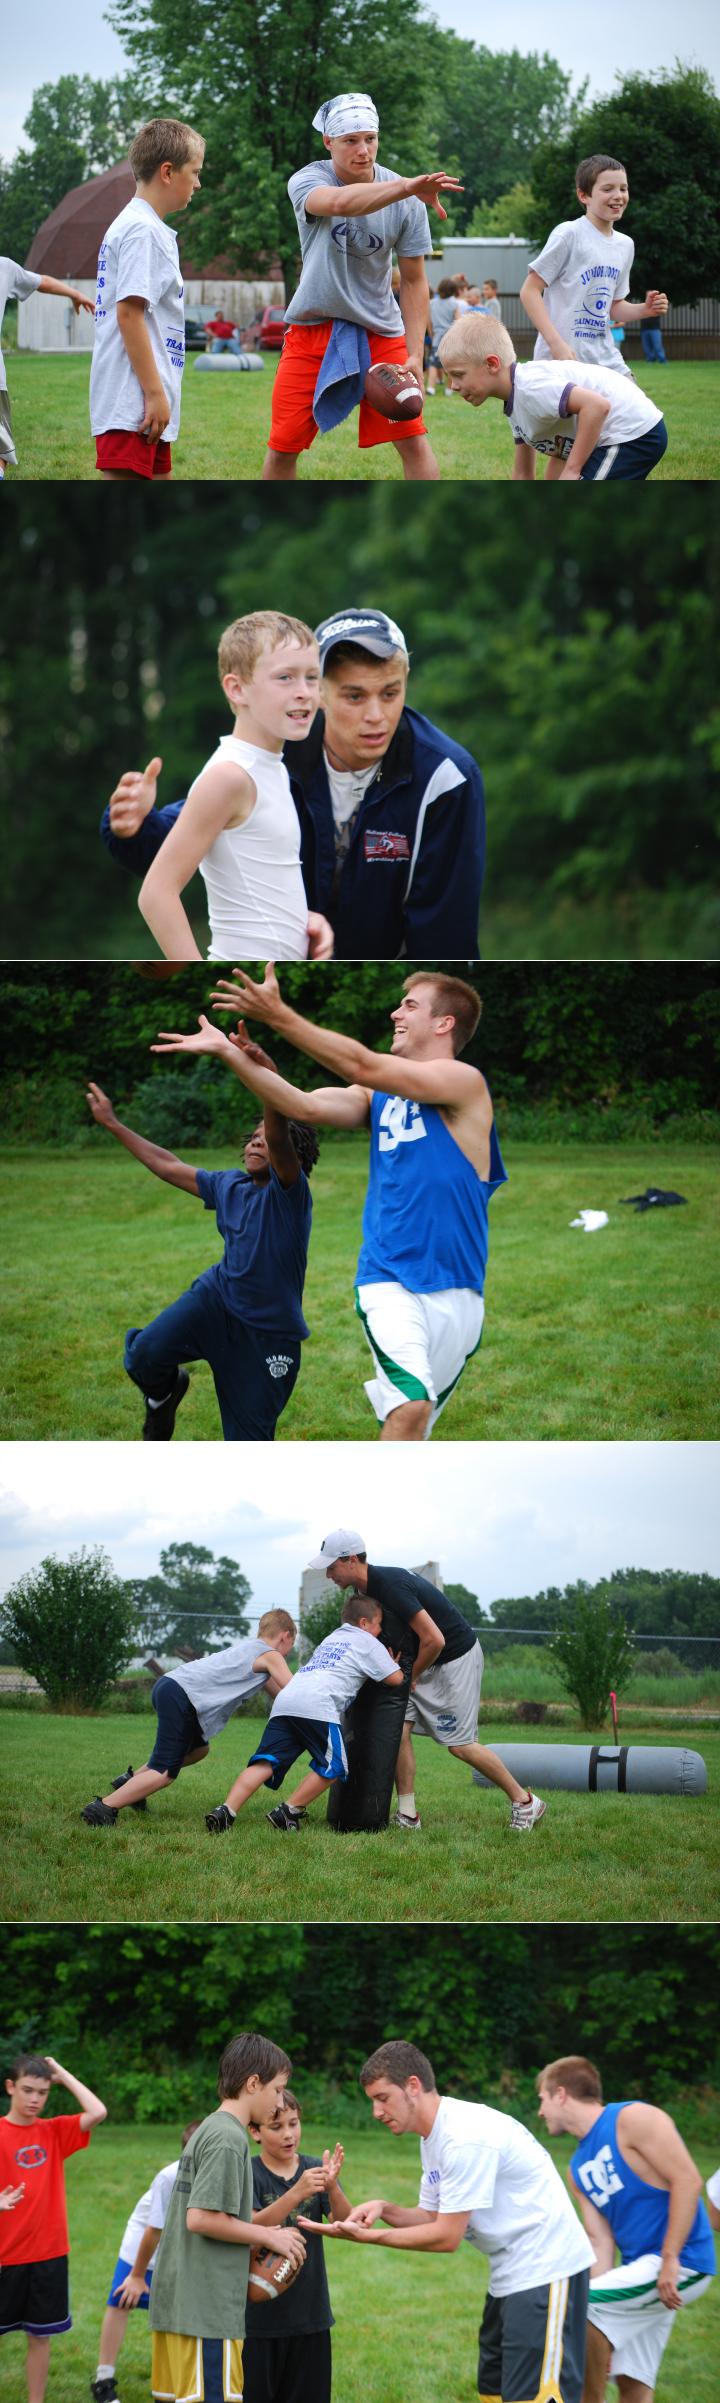 Camp photos copy